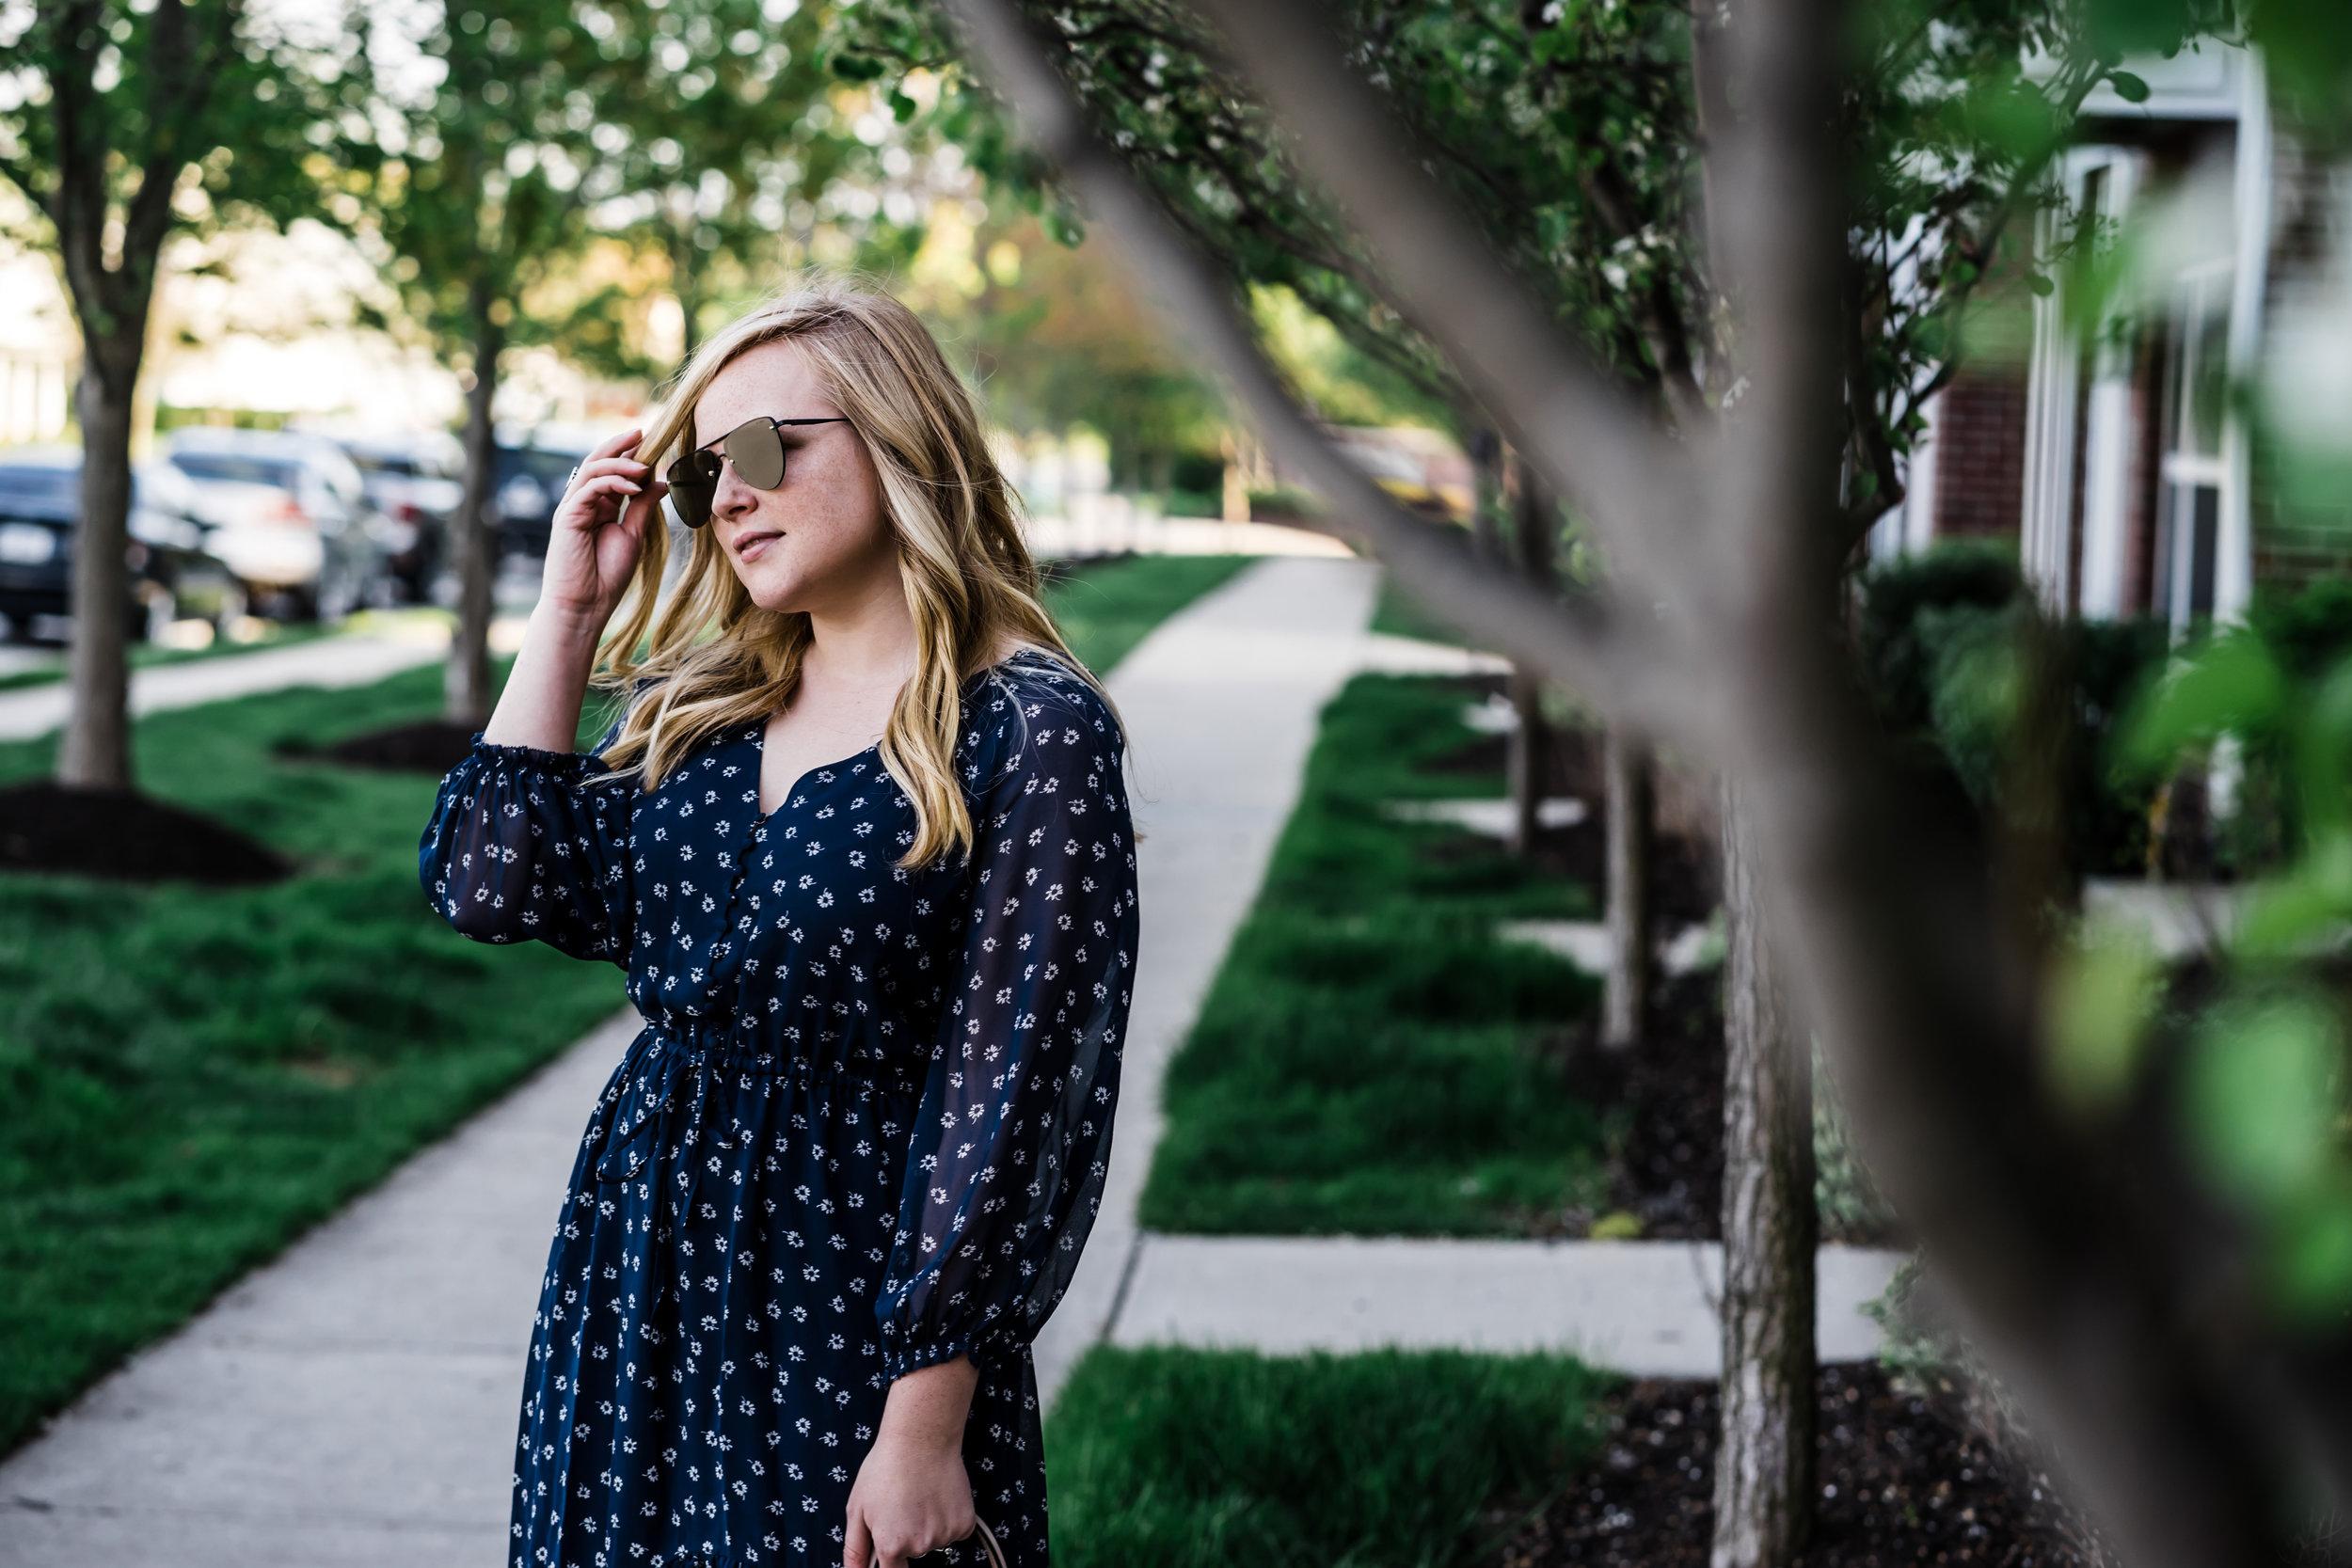 Maggie a la Mode - How to Wear Midi Dresses, Affordable Midi Dresses, Joie Alithea Dress, Loeffler Randall Langley Ruffle Mules, Le Specs The Prince Mirrored Sunglasses, Camelia Roma Leather Satchel